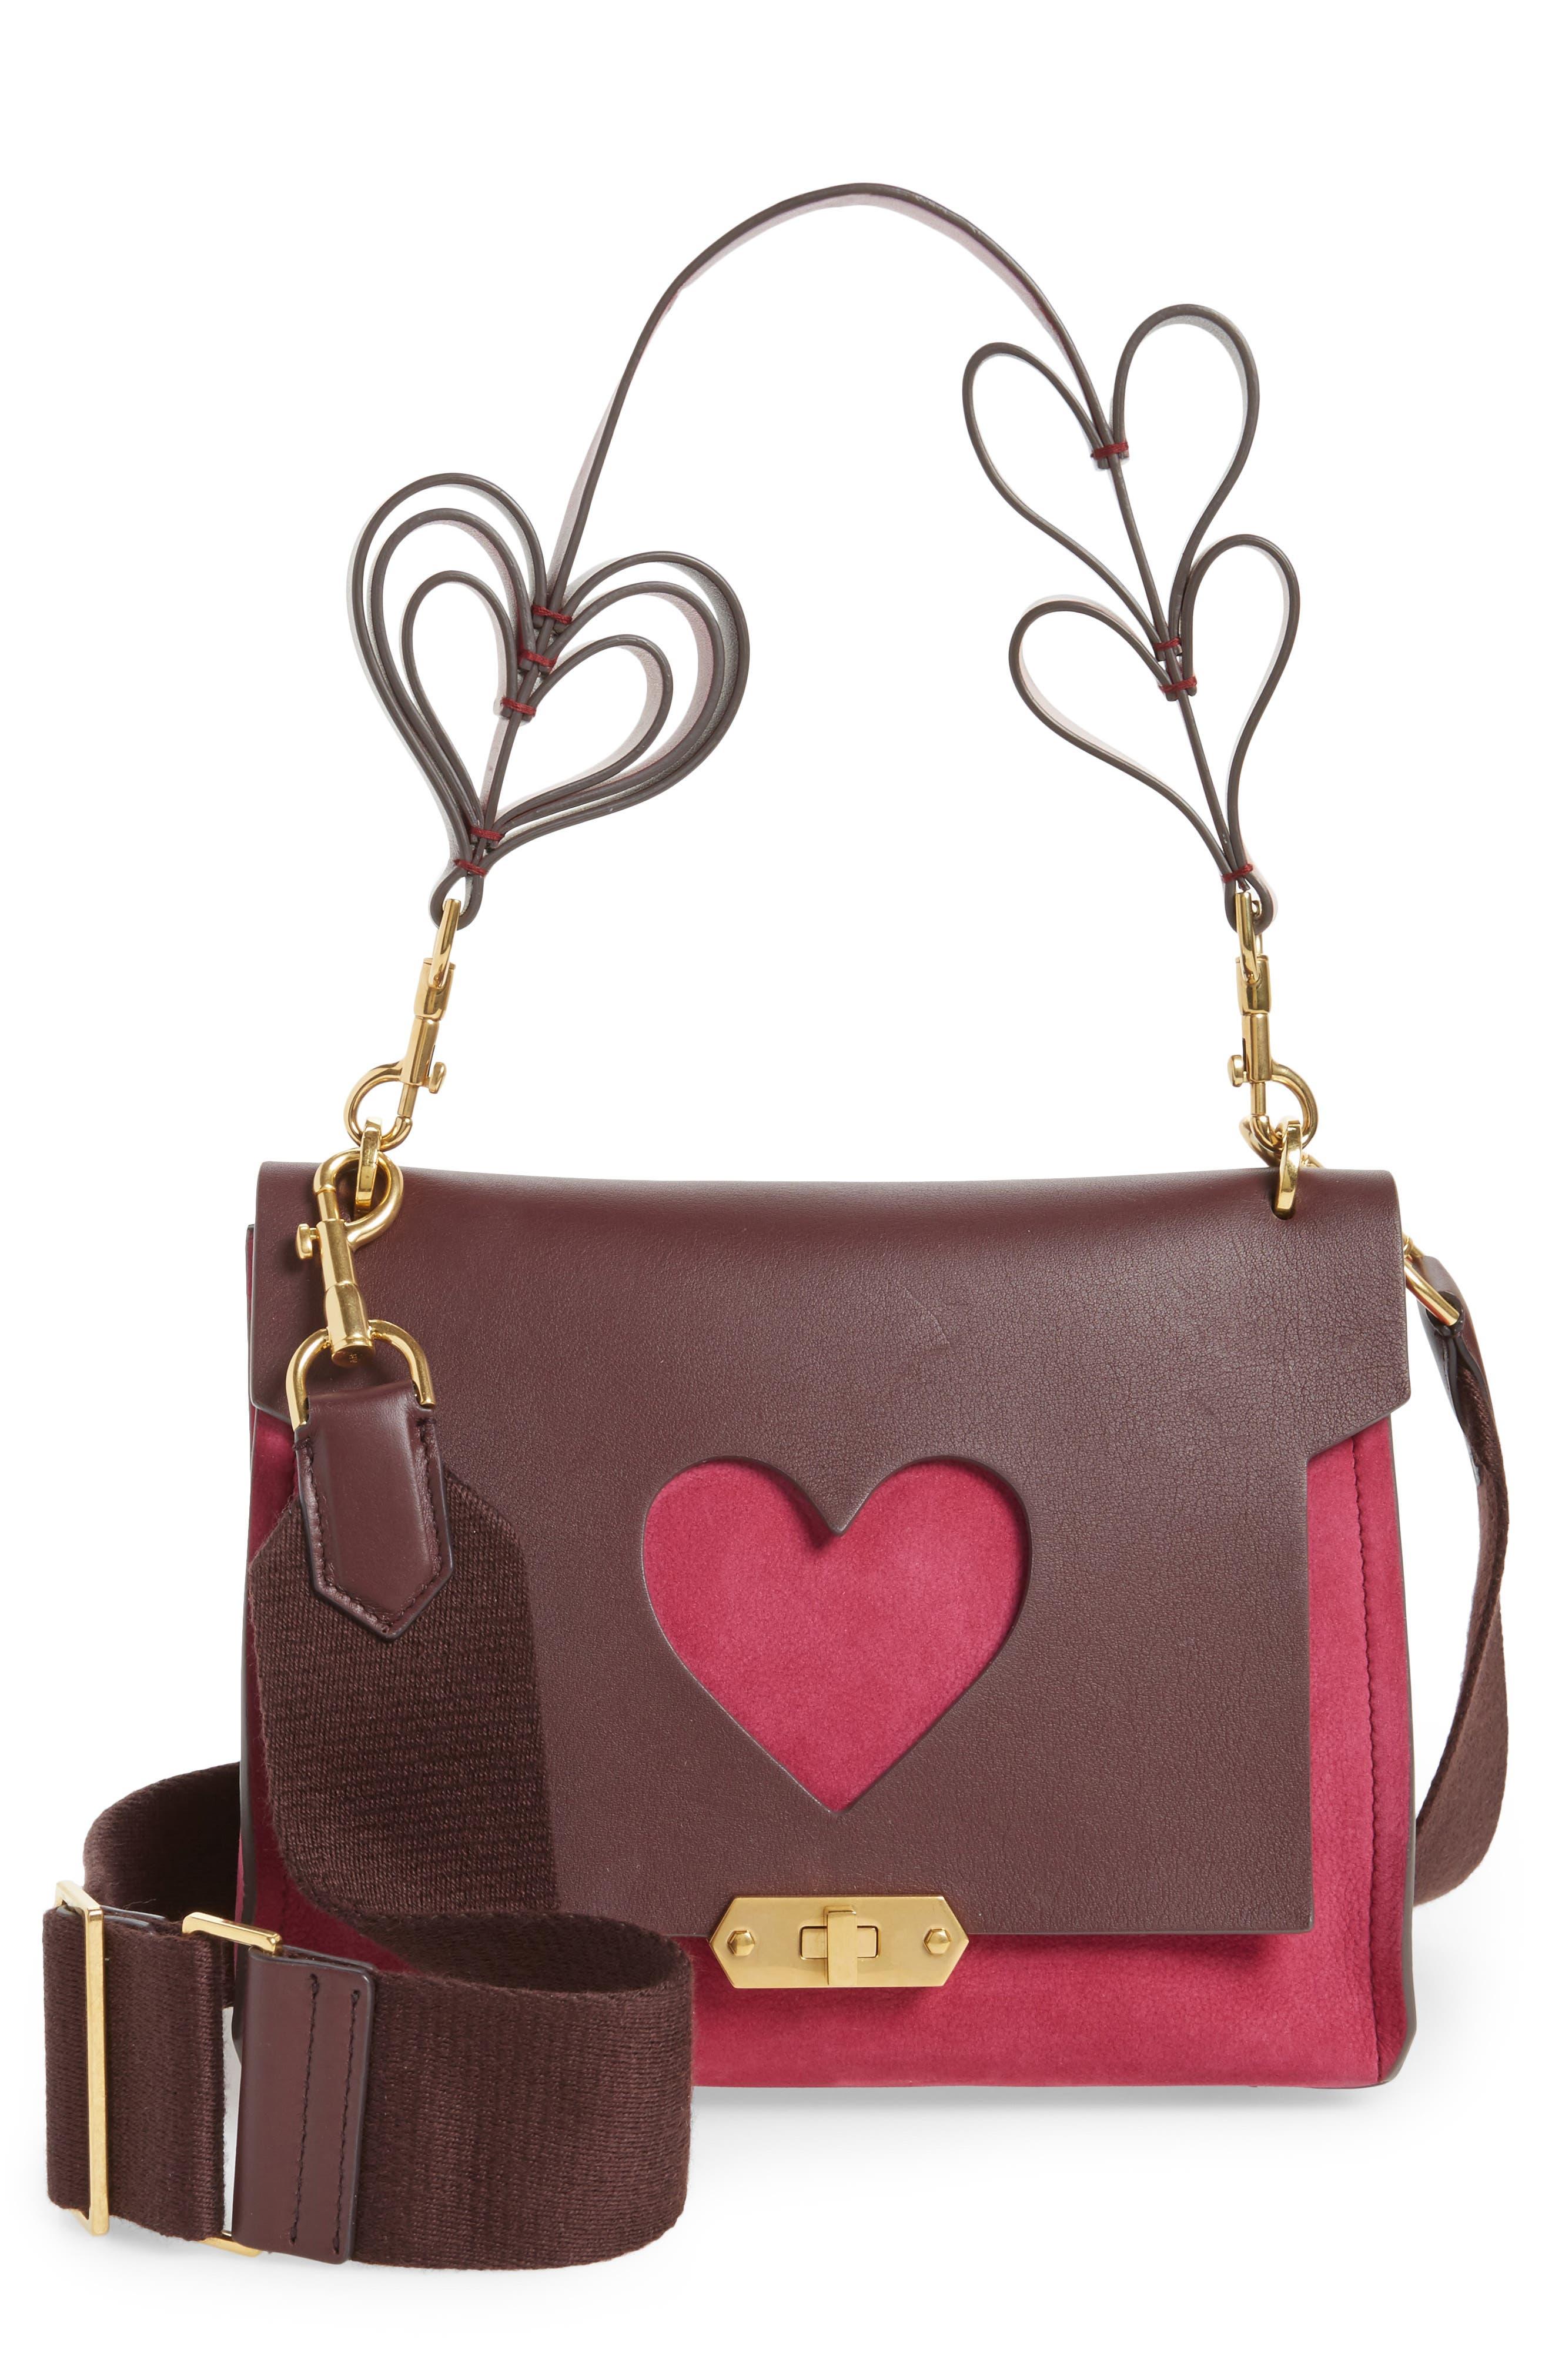 Anya Hindmarch Extra Small Bathhurst Heart Leather Shoulder Bag